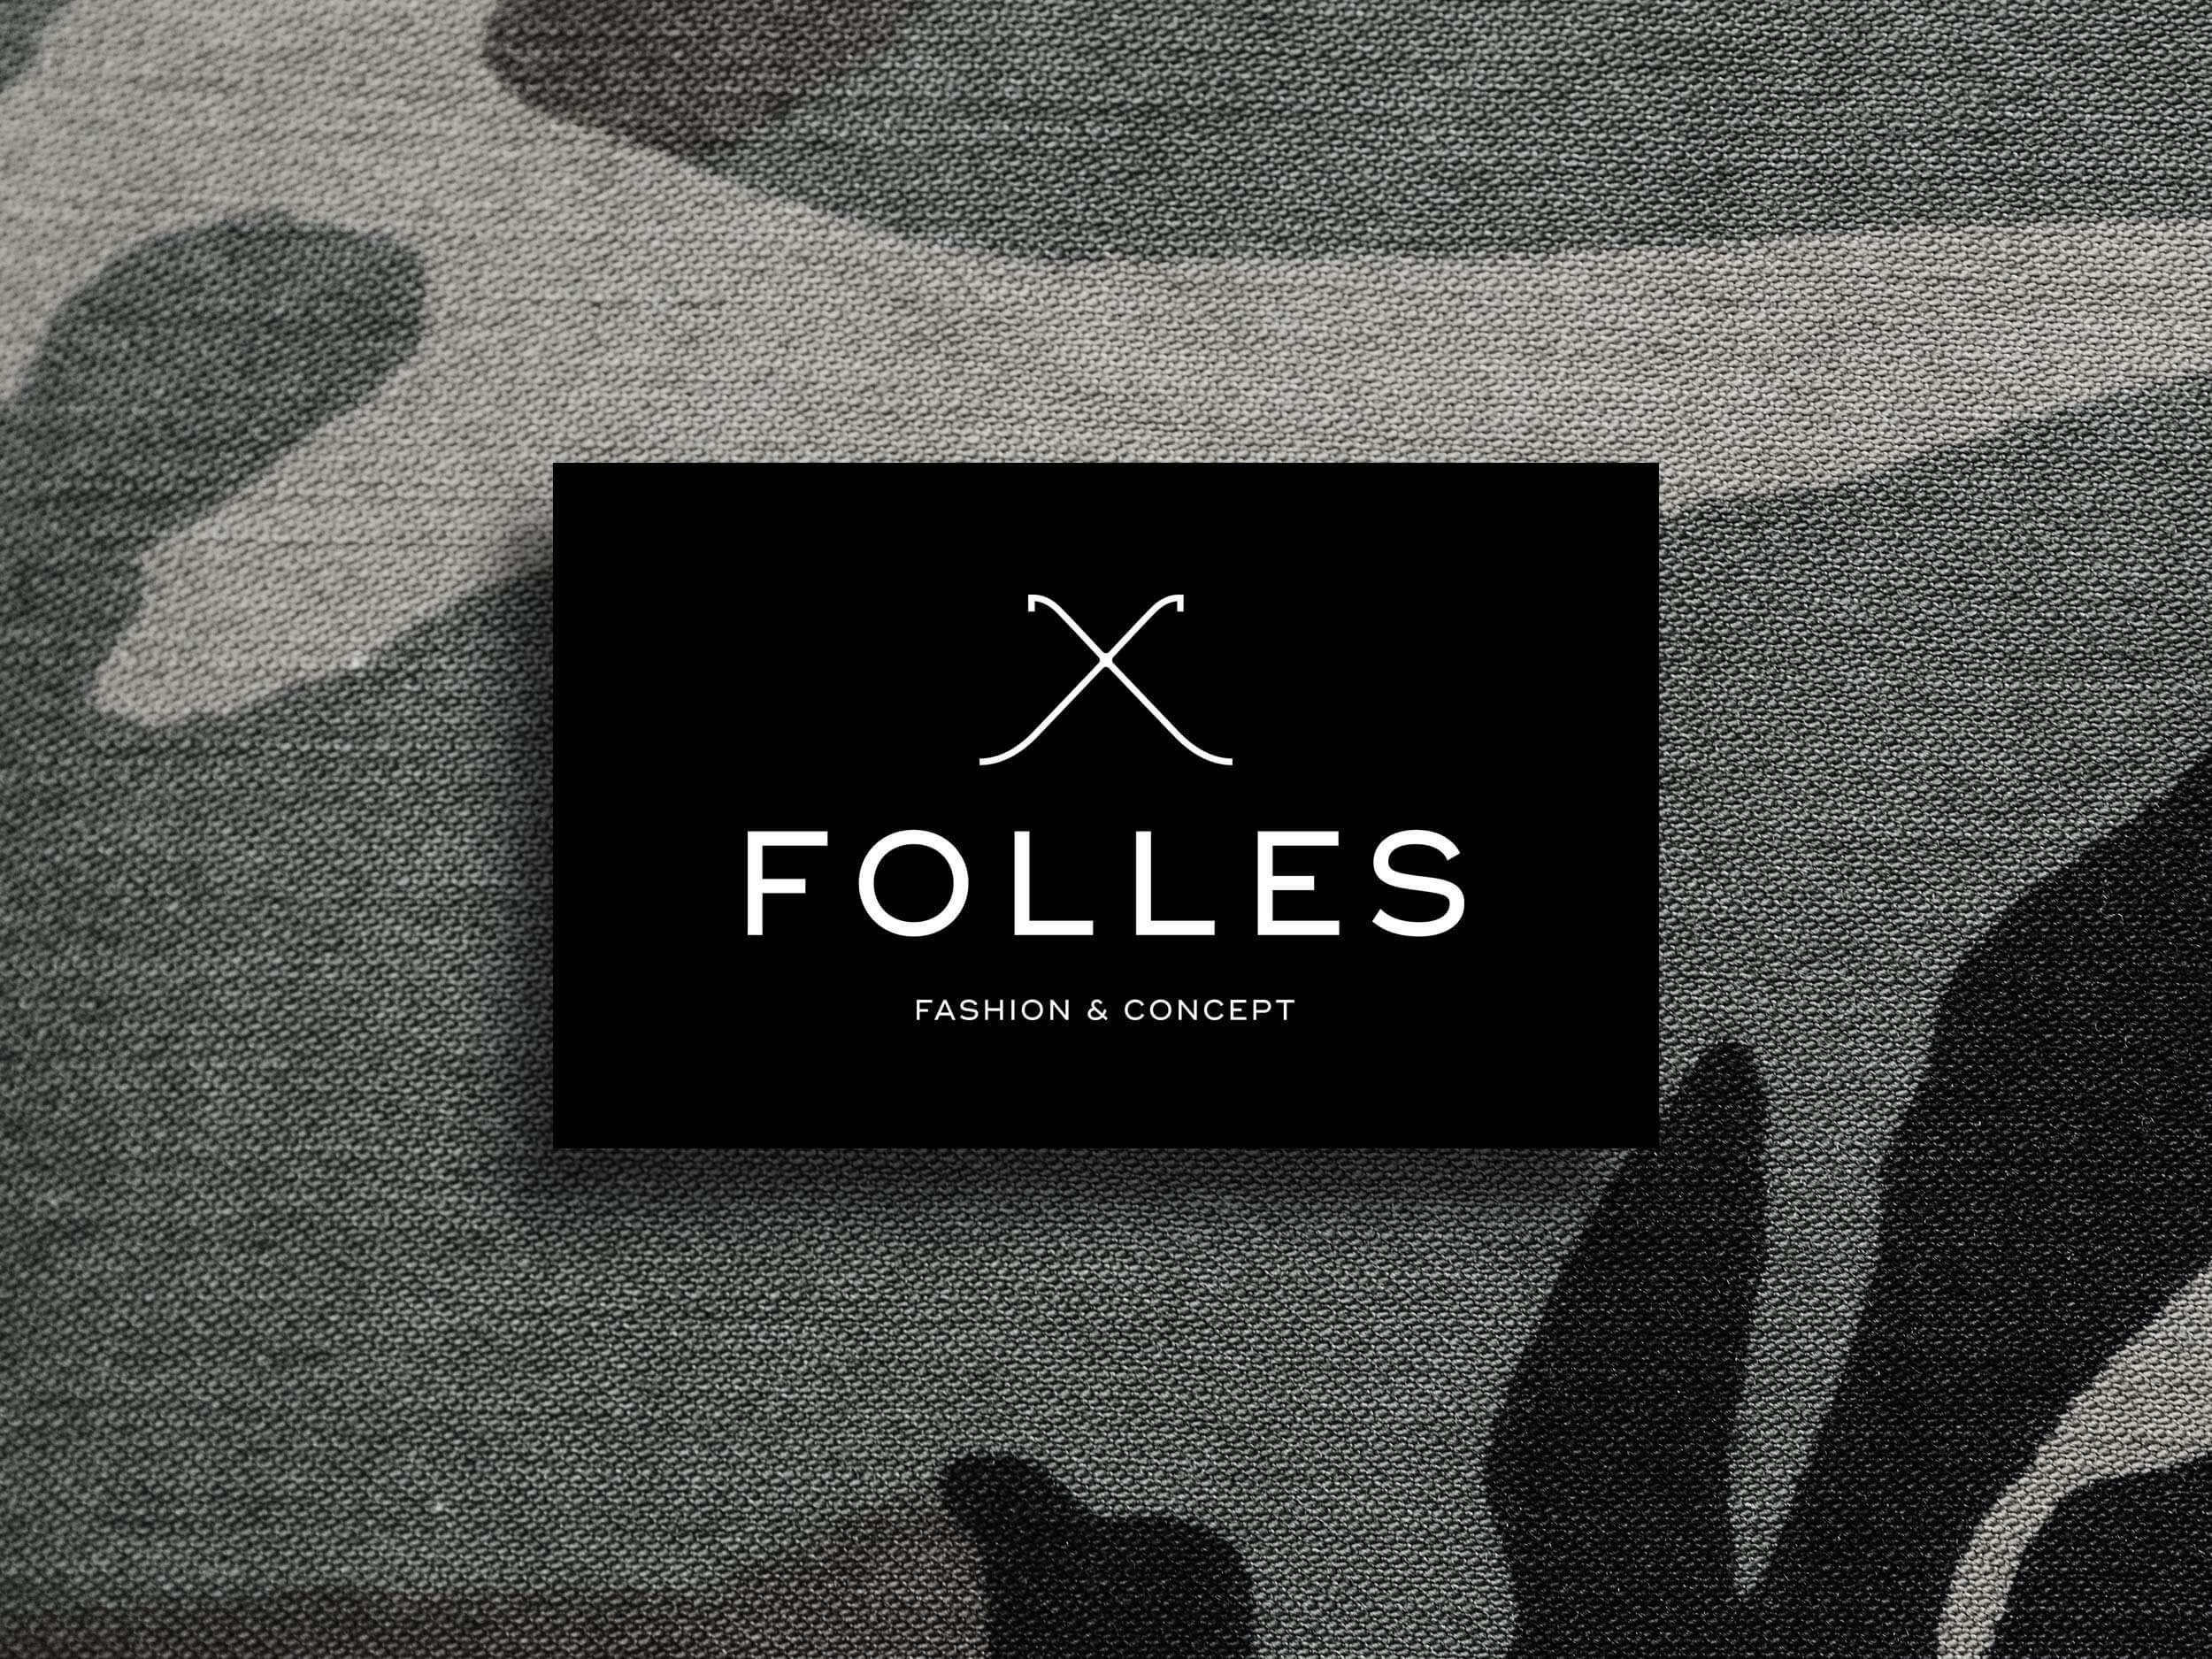 Folles Fashion